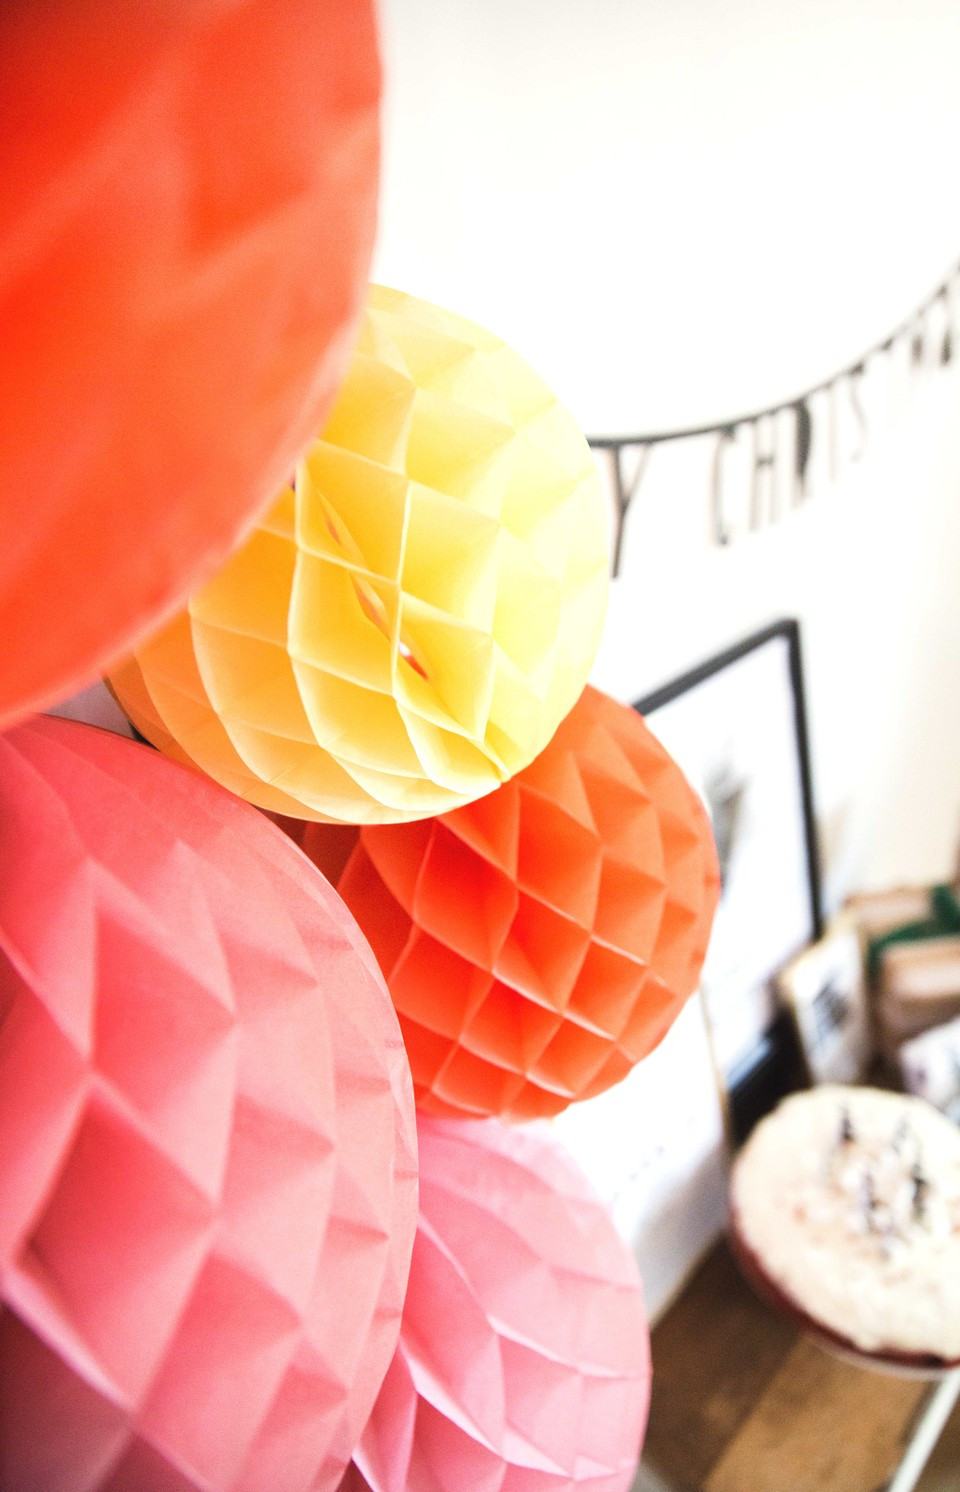 DIY, Tutorial, How to, Anleitung, Aufbauhilfe, Wabenbälle, Honeycombs, Dekotipps, Partydeko, Party in a Box, Party aus der Box